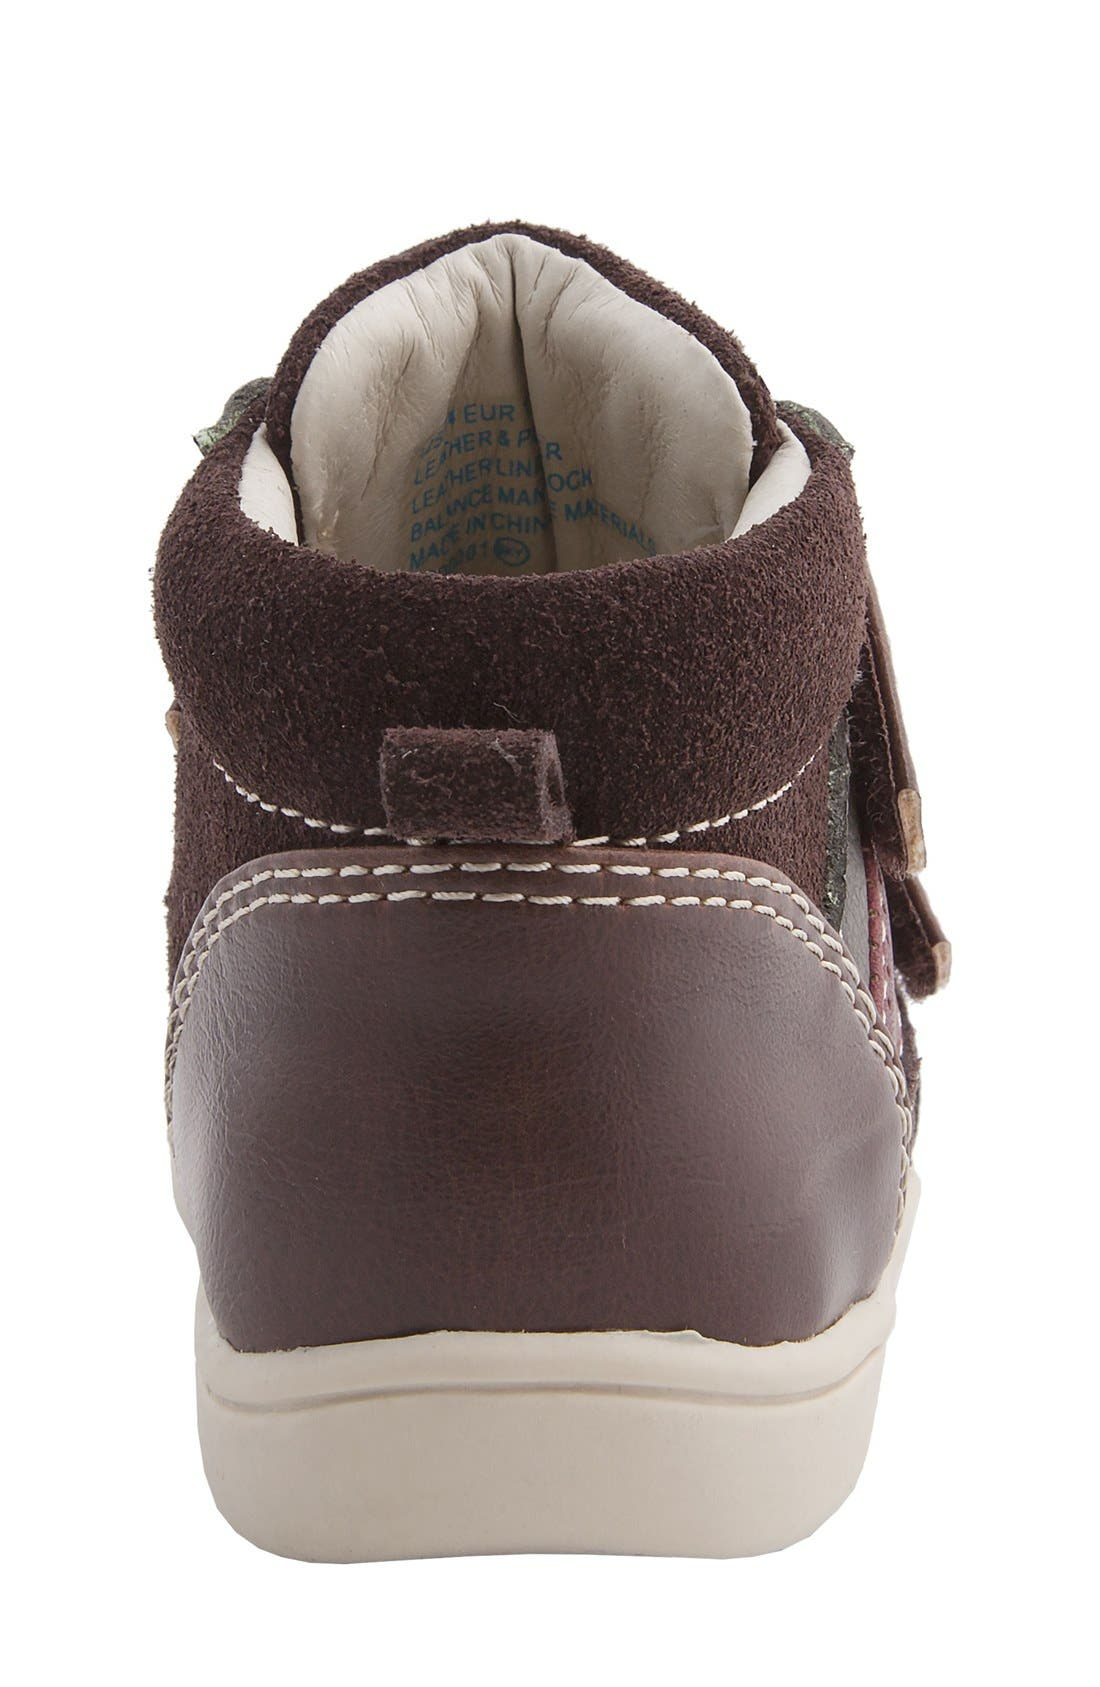 Nina 'Cairo' High Top Sneaker,                             Alternate thumbnail 4, color,                             Brown Suede